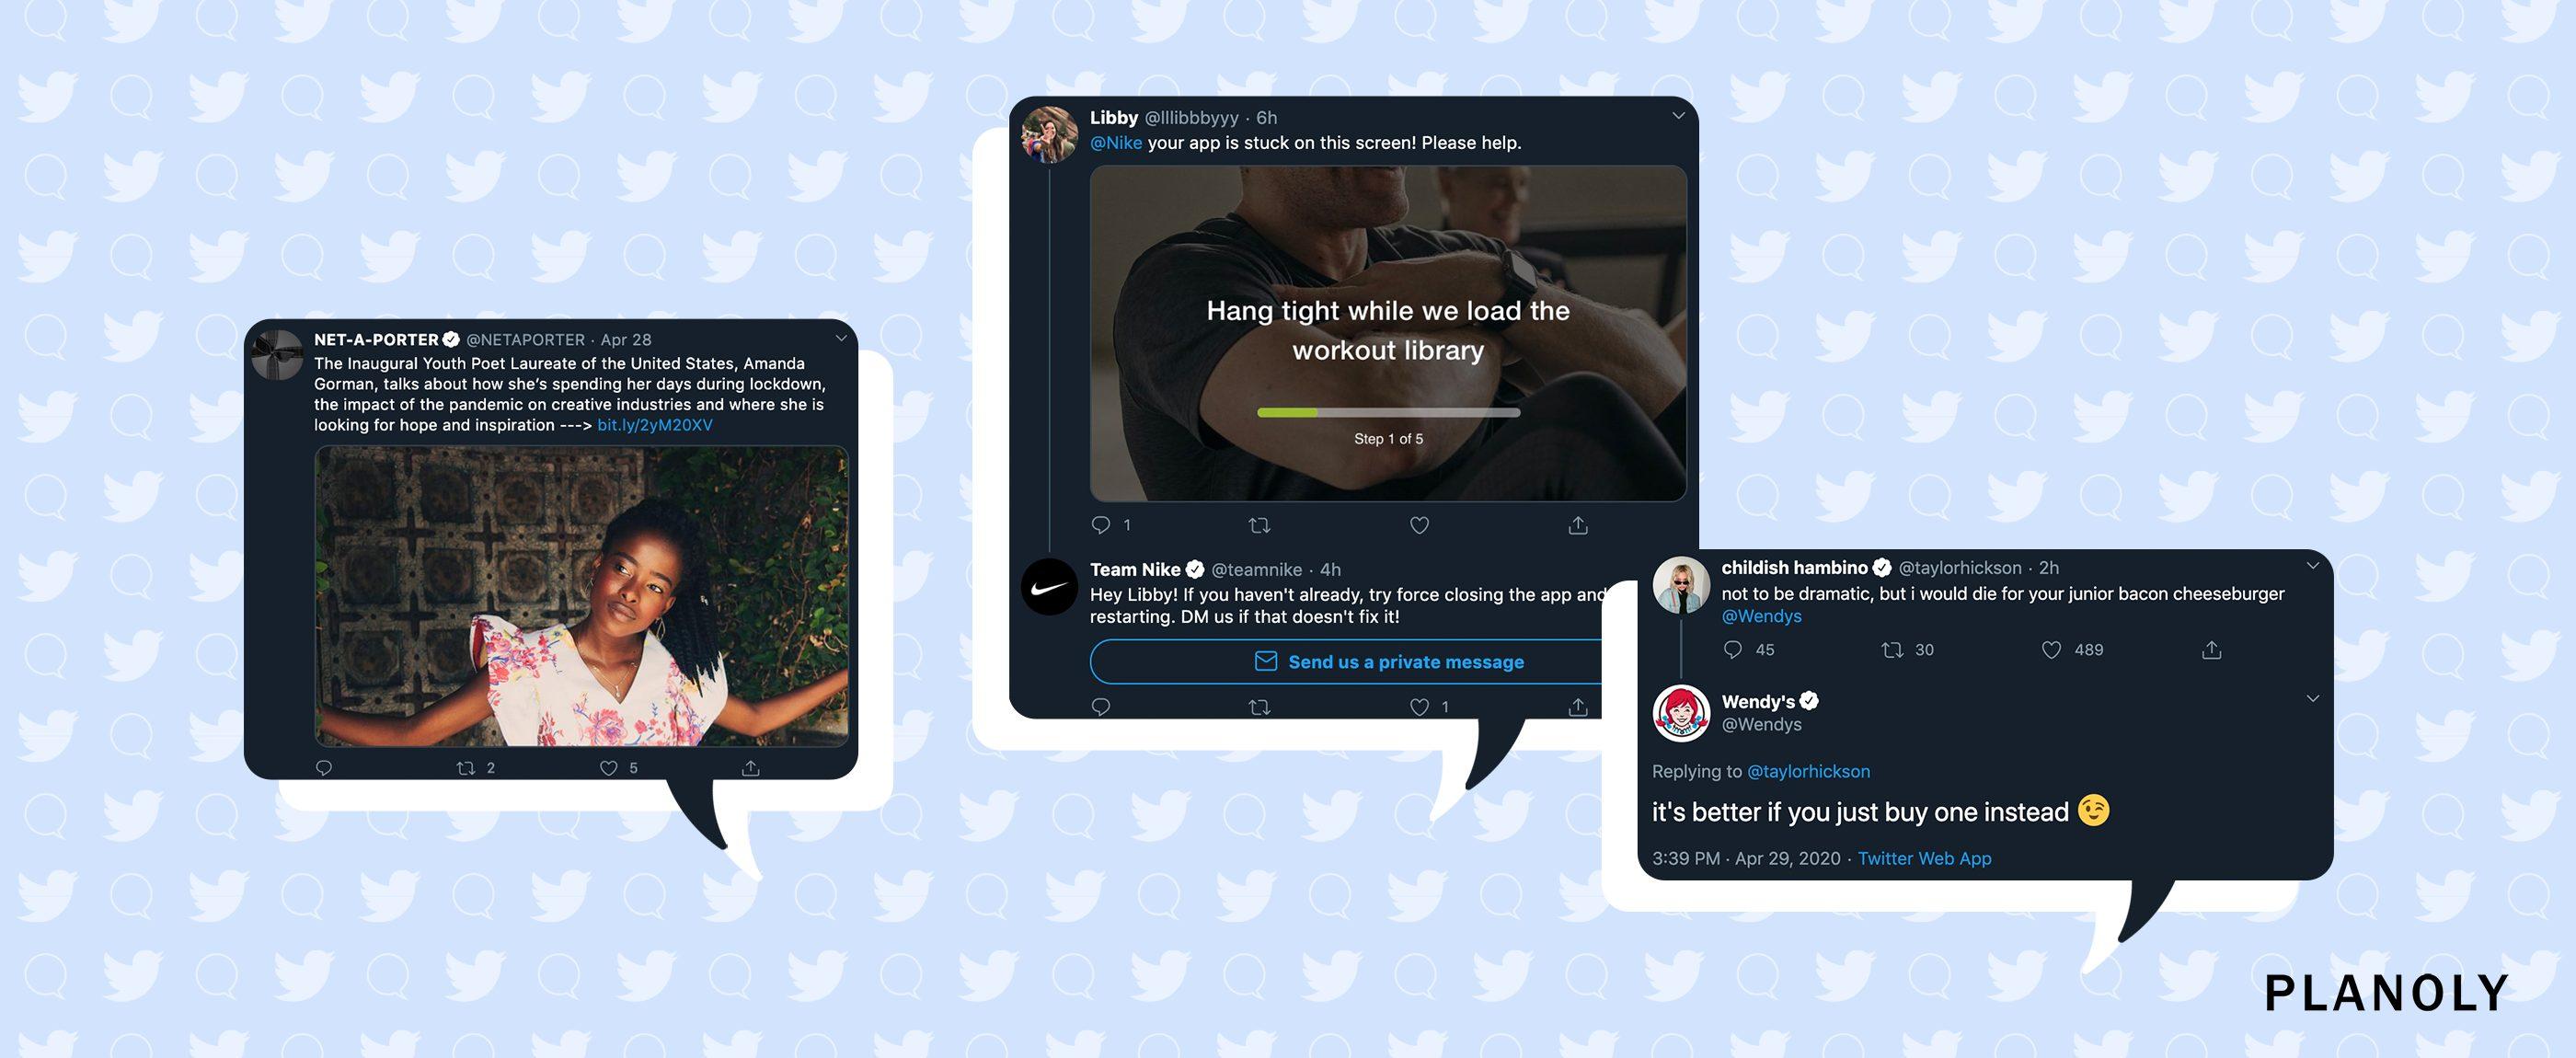 PLANOLY-Blog-Post-Twitter-Marketing-Strategies-Banner